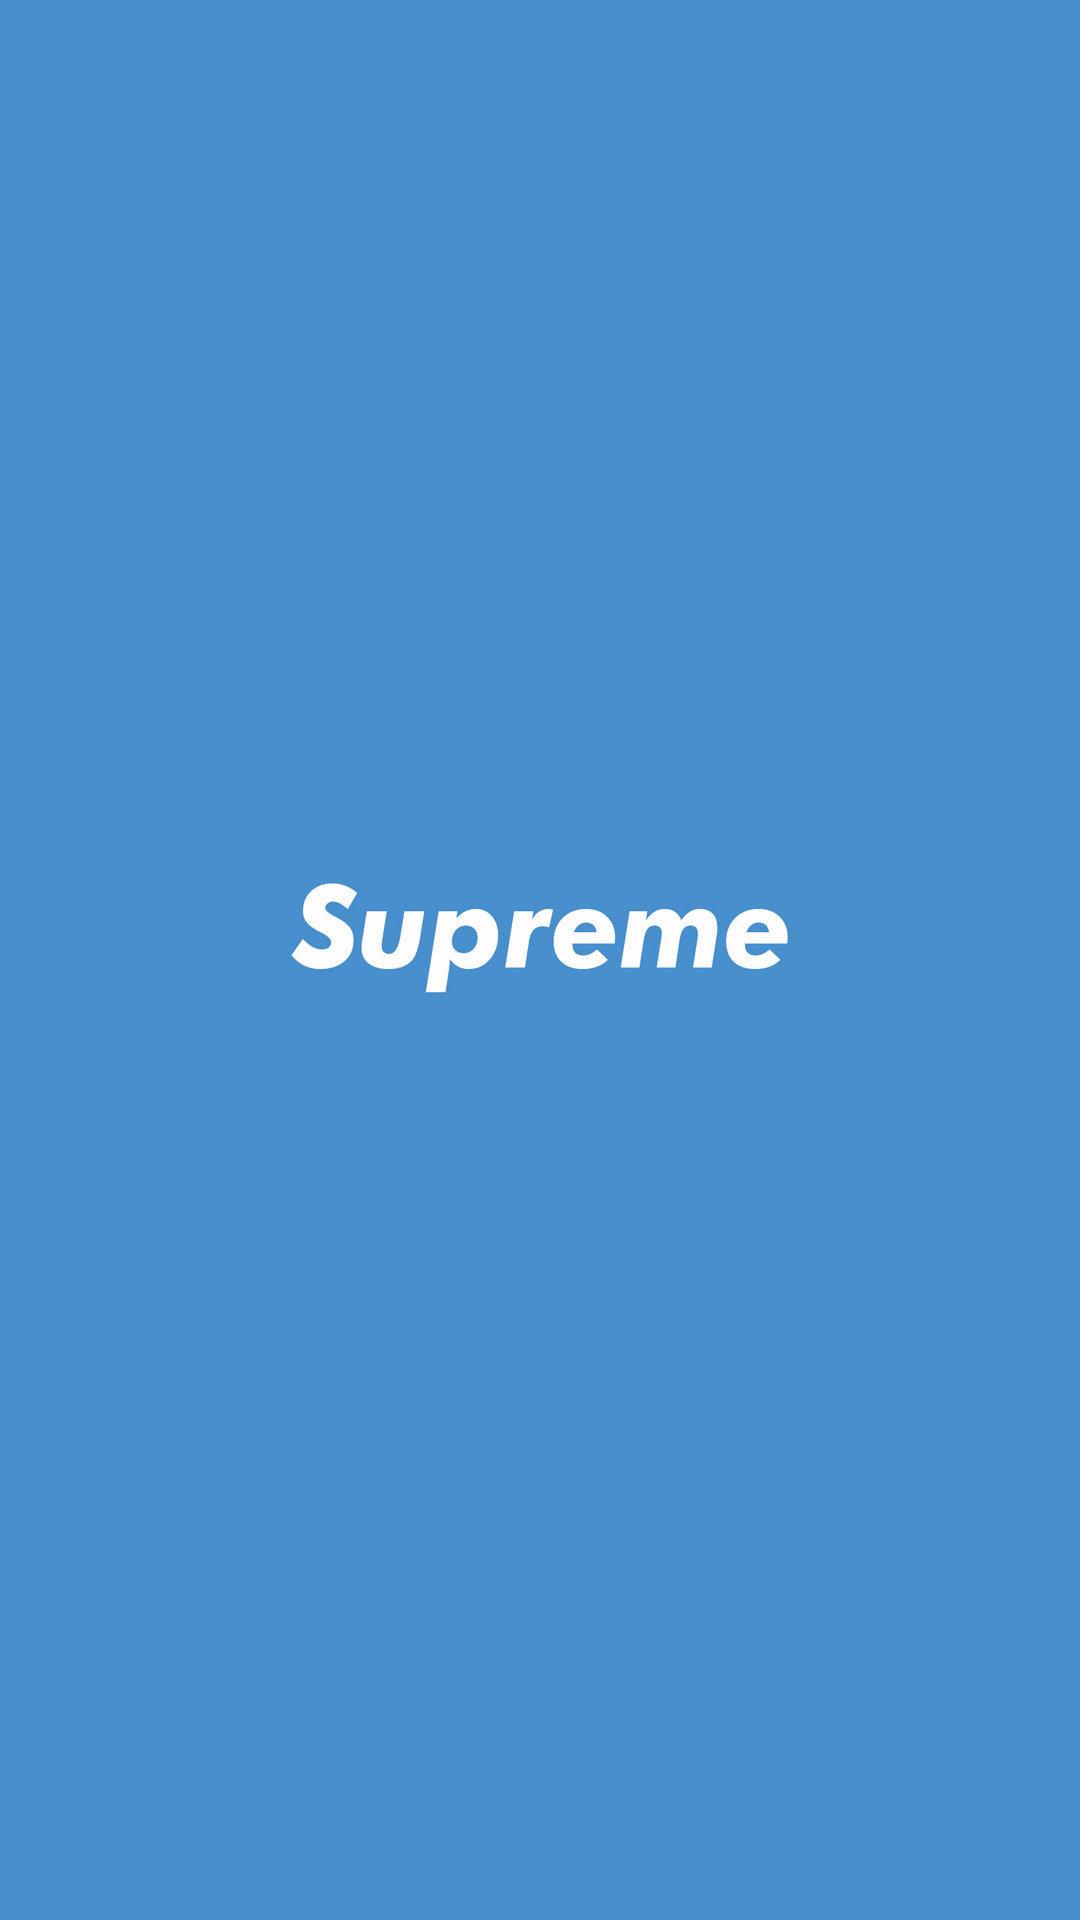 Skate Girl Wallpaper Iphone Supreme Blue Wallpaper Authenticsupreme Com